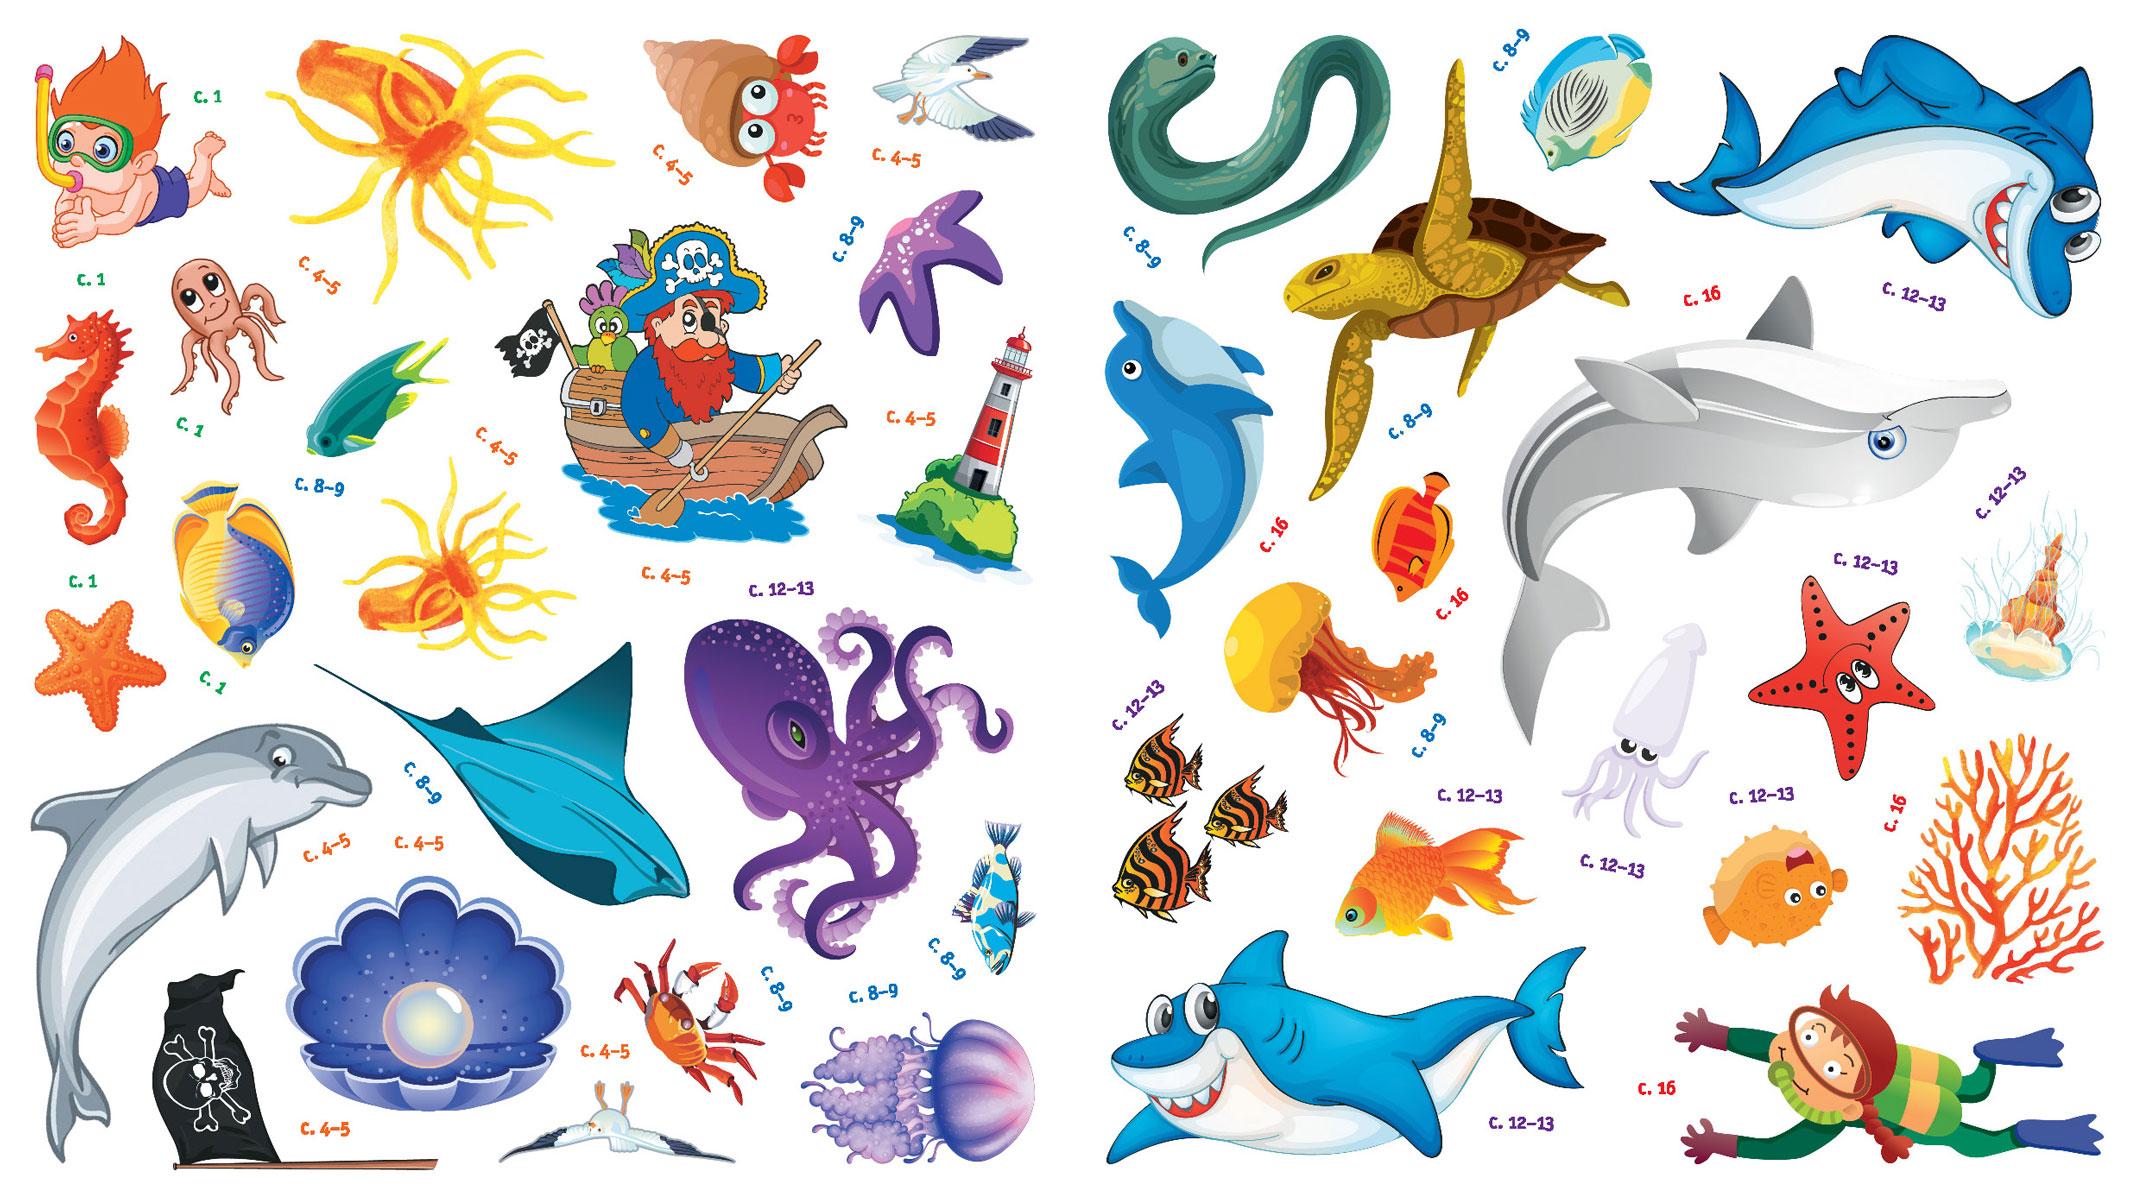 Дома картинки, картинки на морскую тему для детей